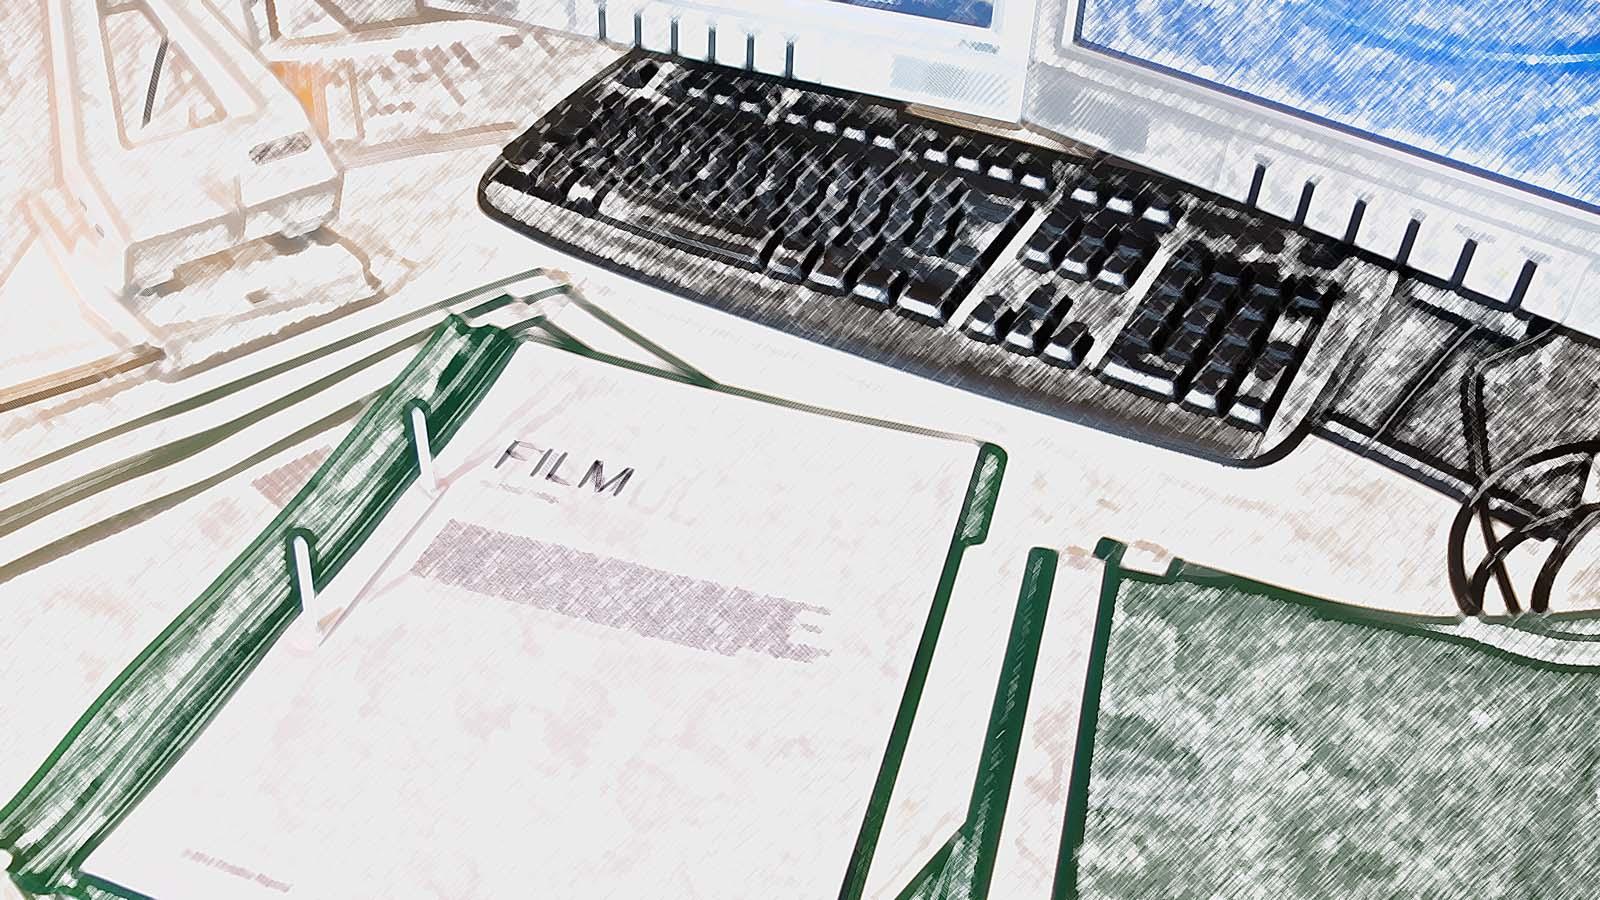 Drehbuchvertrag